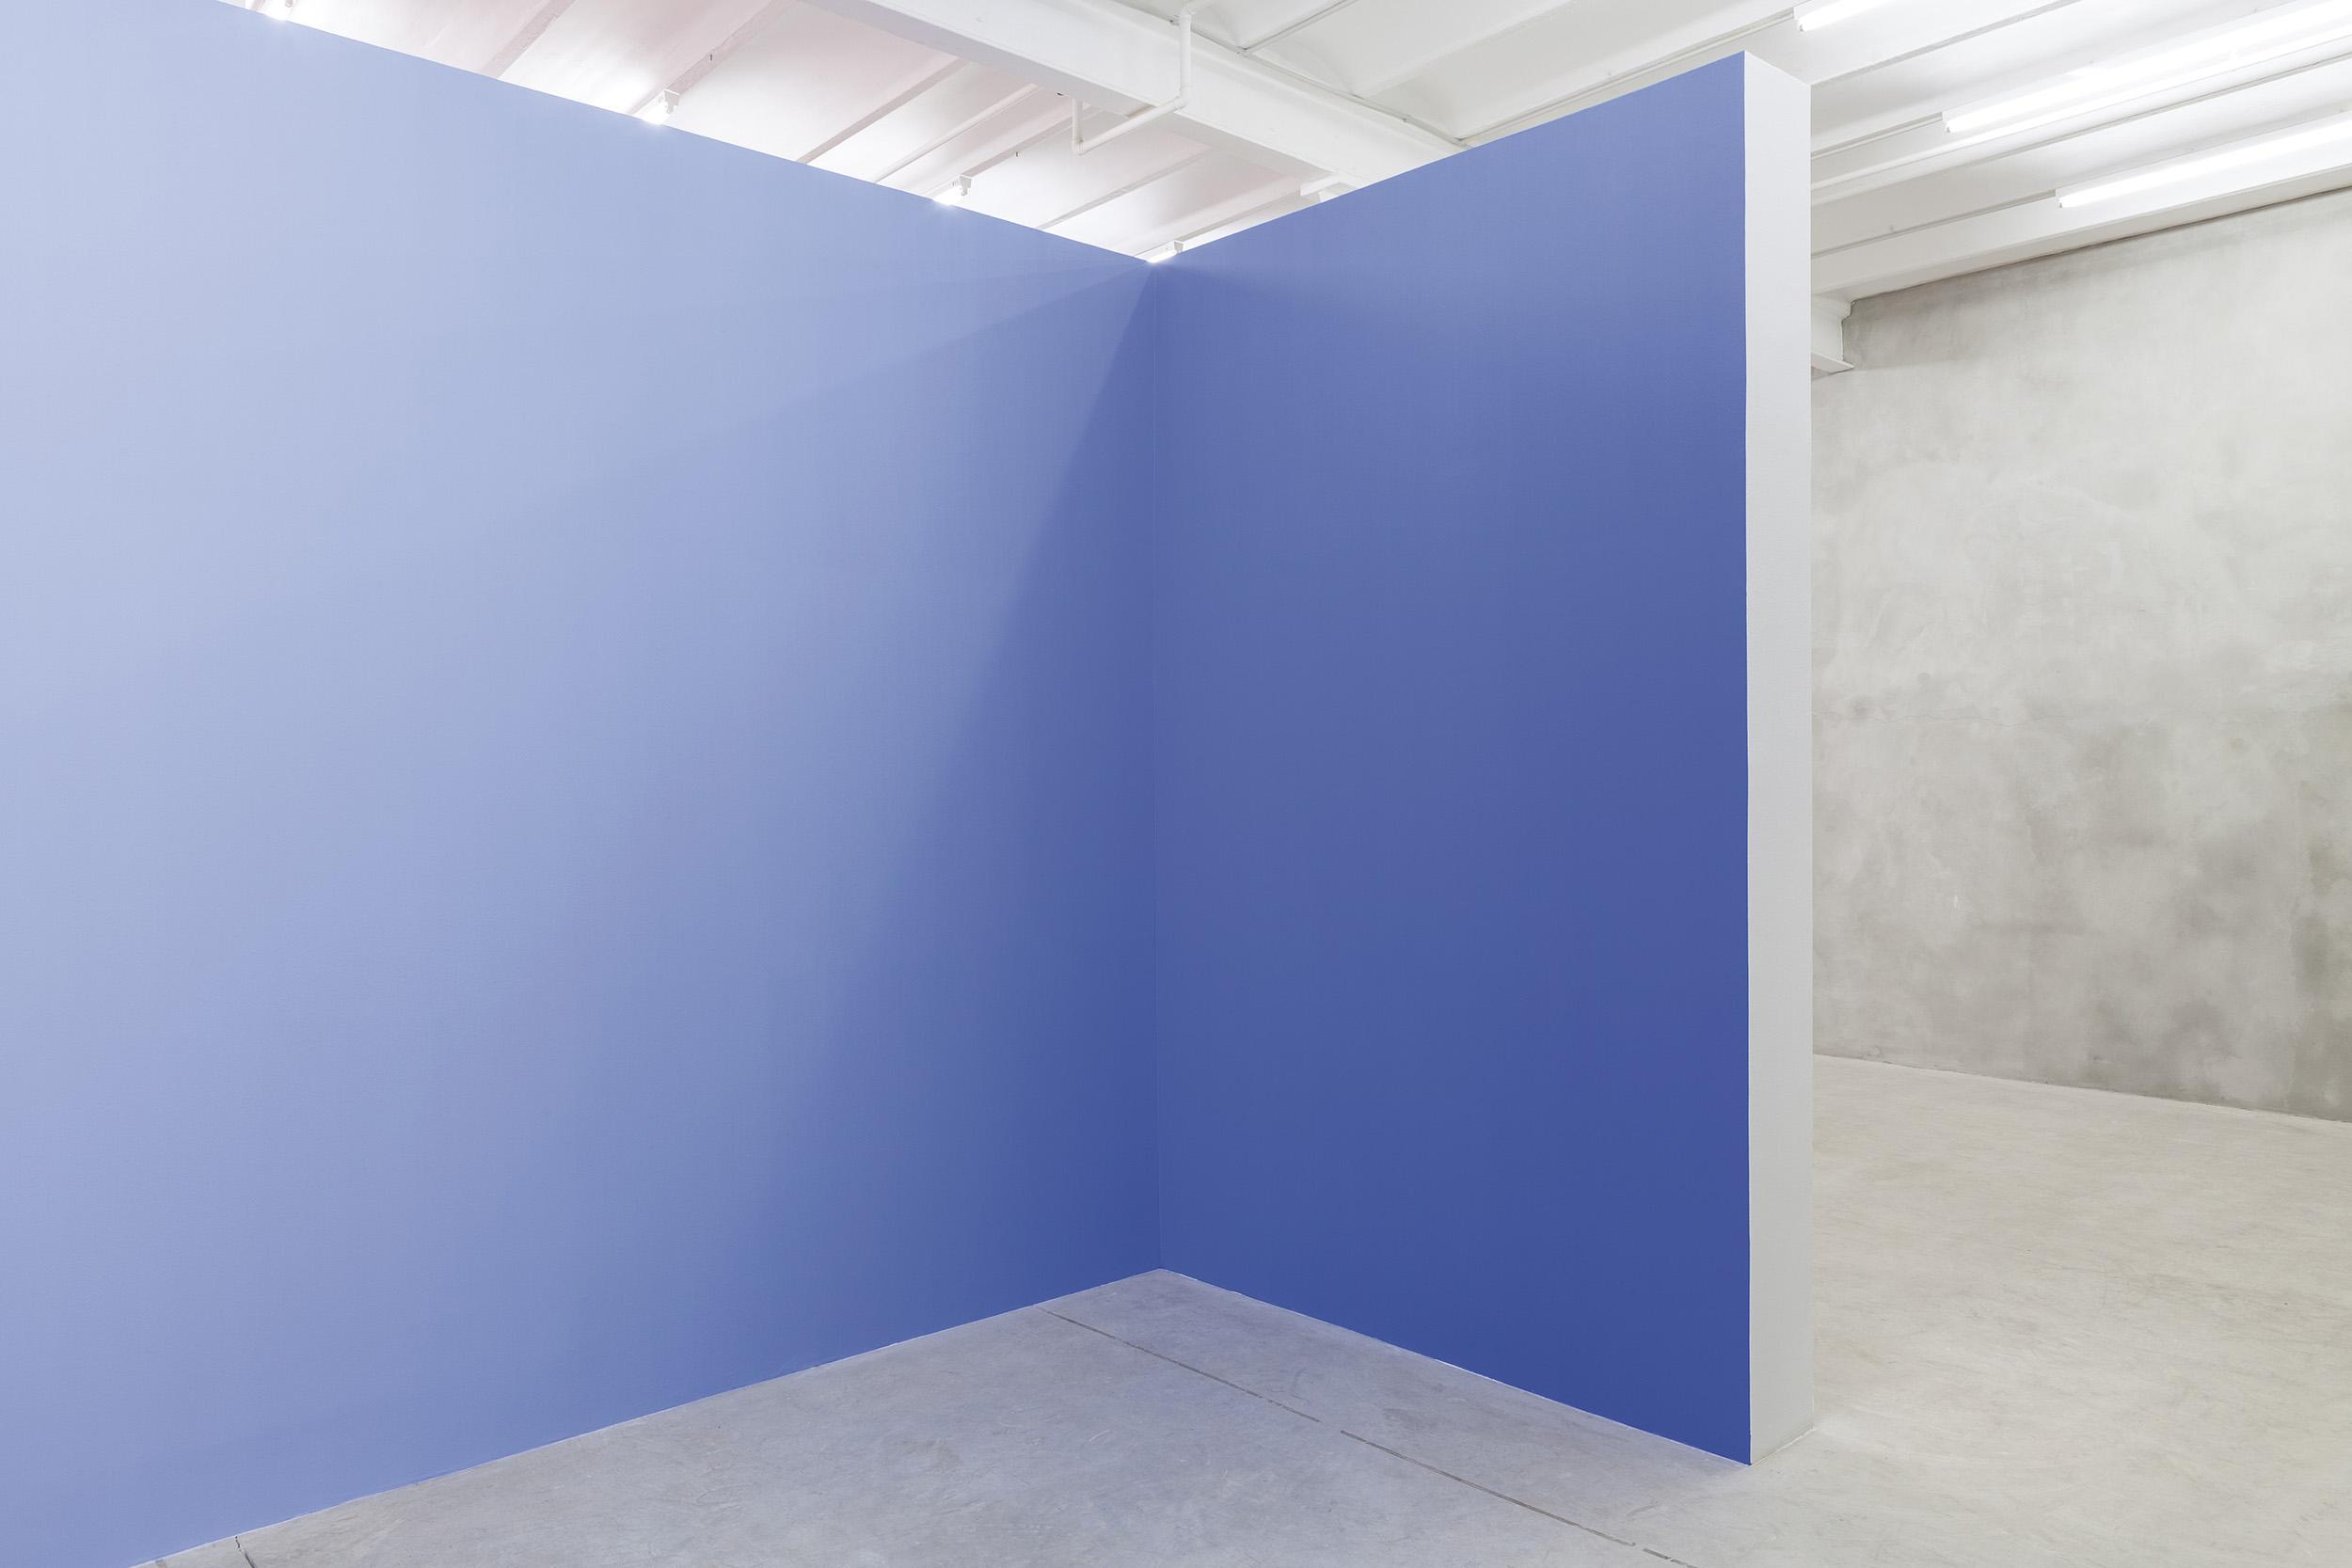 7 - Pieter Vermeersch at Blueproject Foundation Barcelona